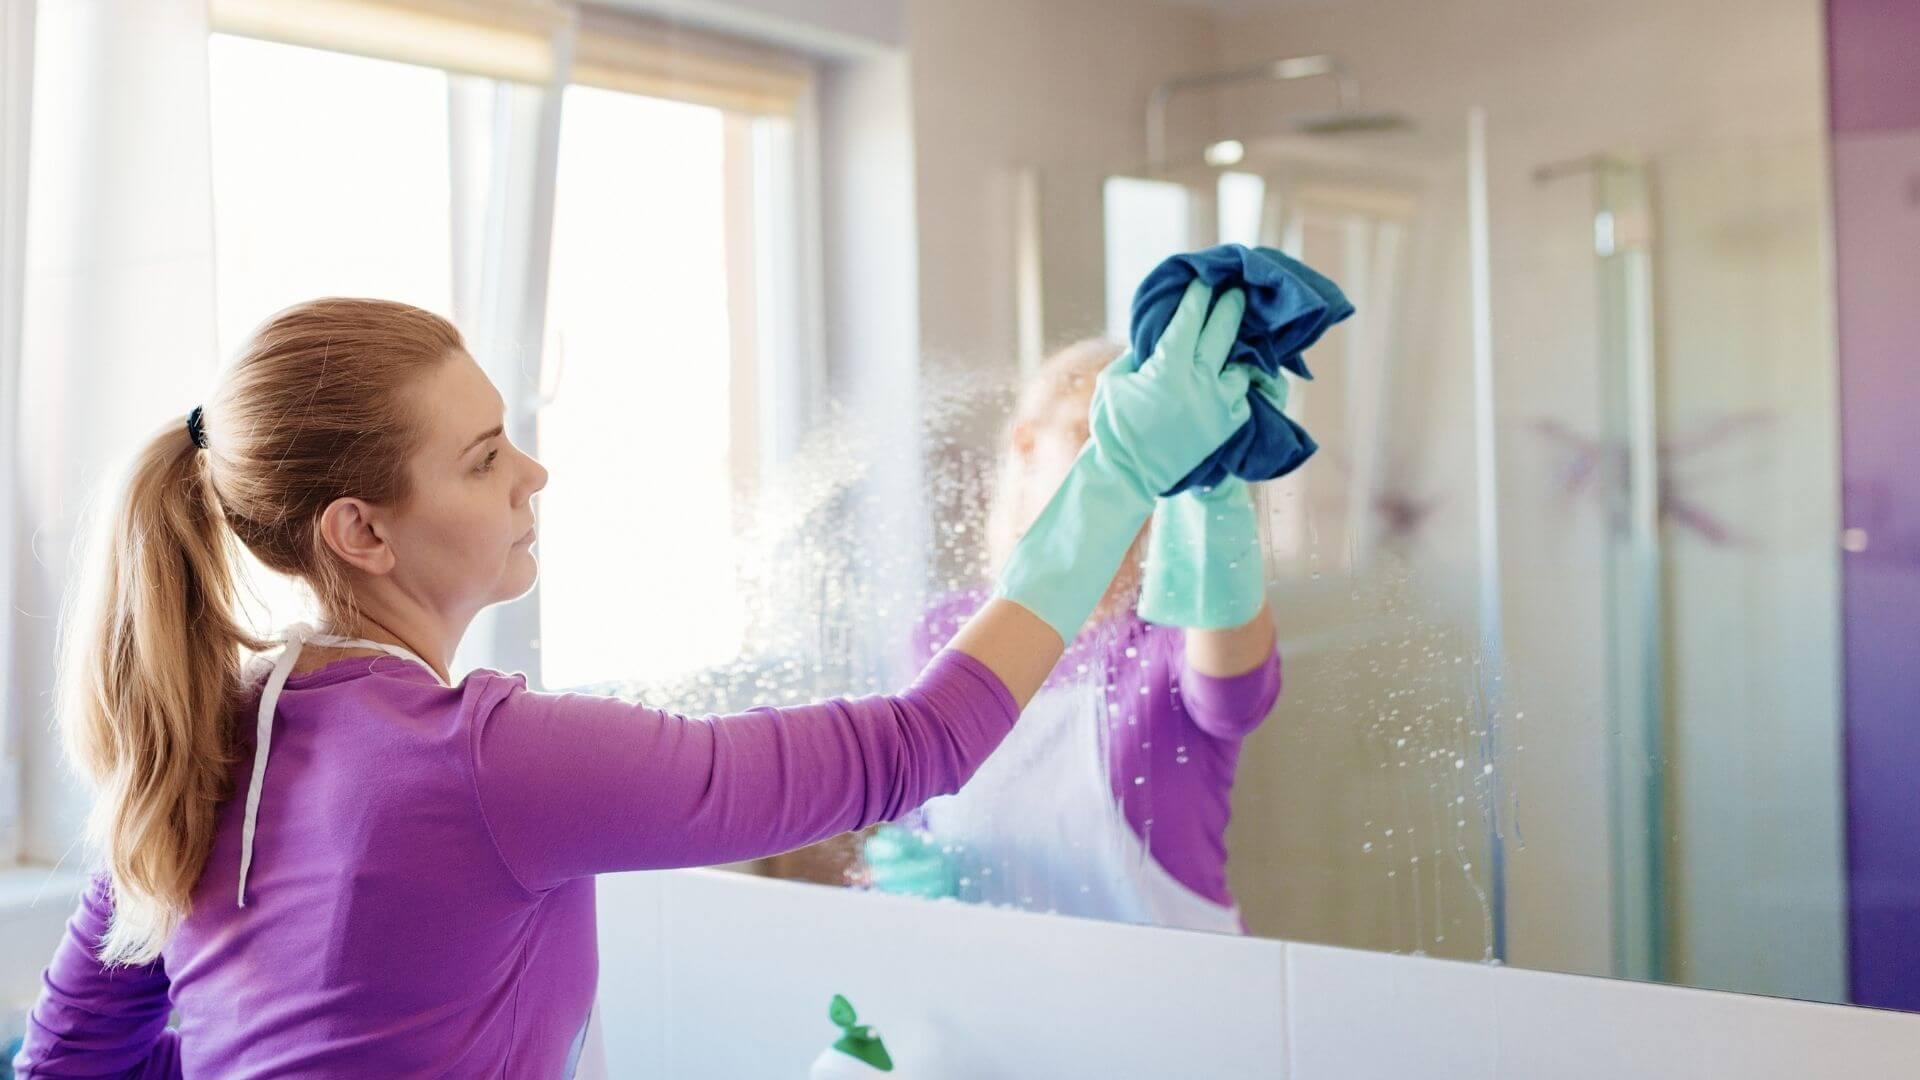 limpeza da casa espelhos e box